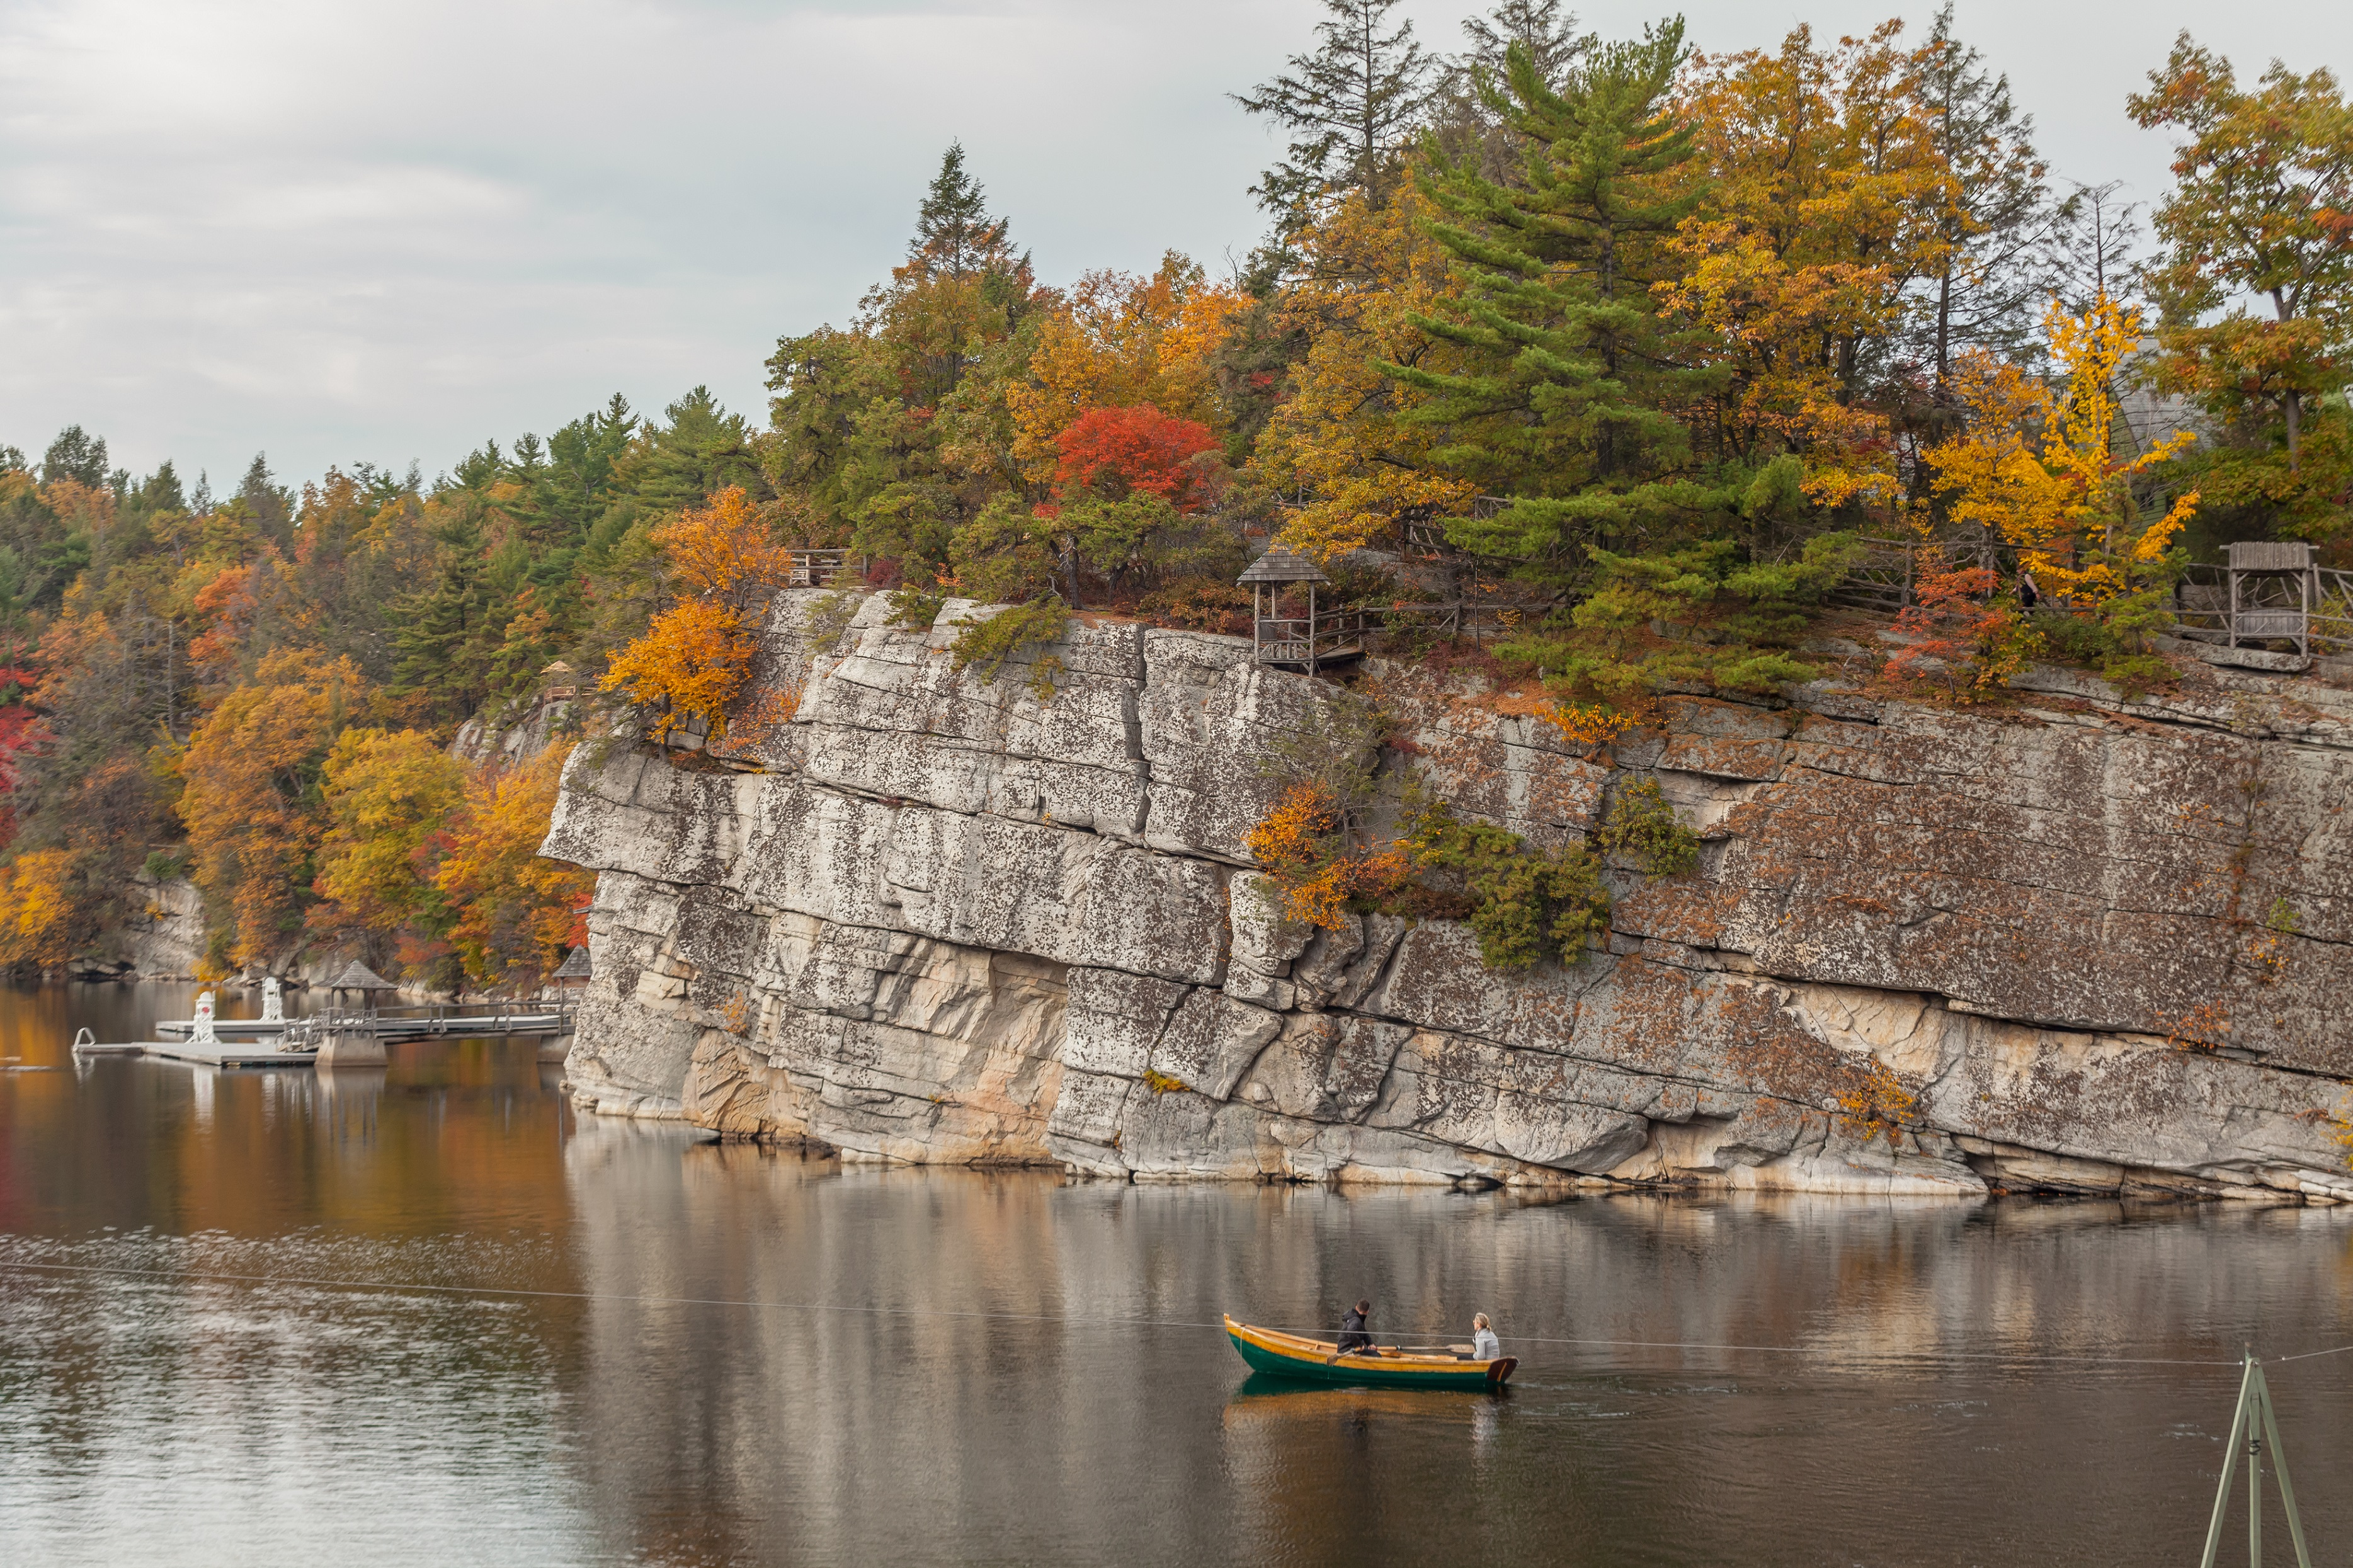 Mohonk_Fall-Foliage-Boating-on-Lake-Mohonk